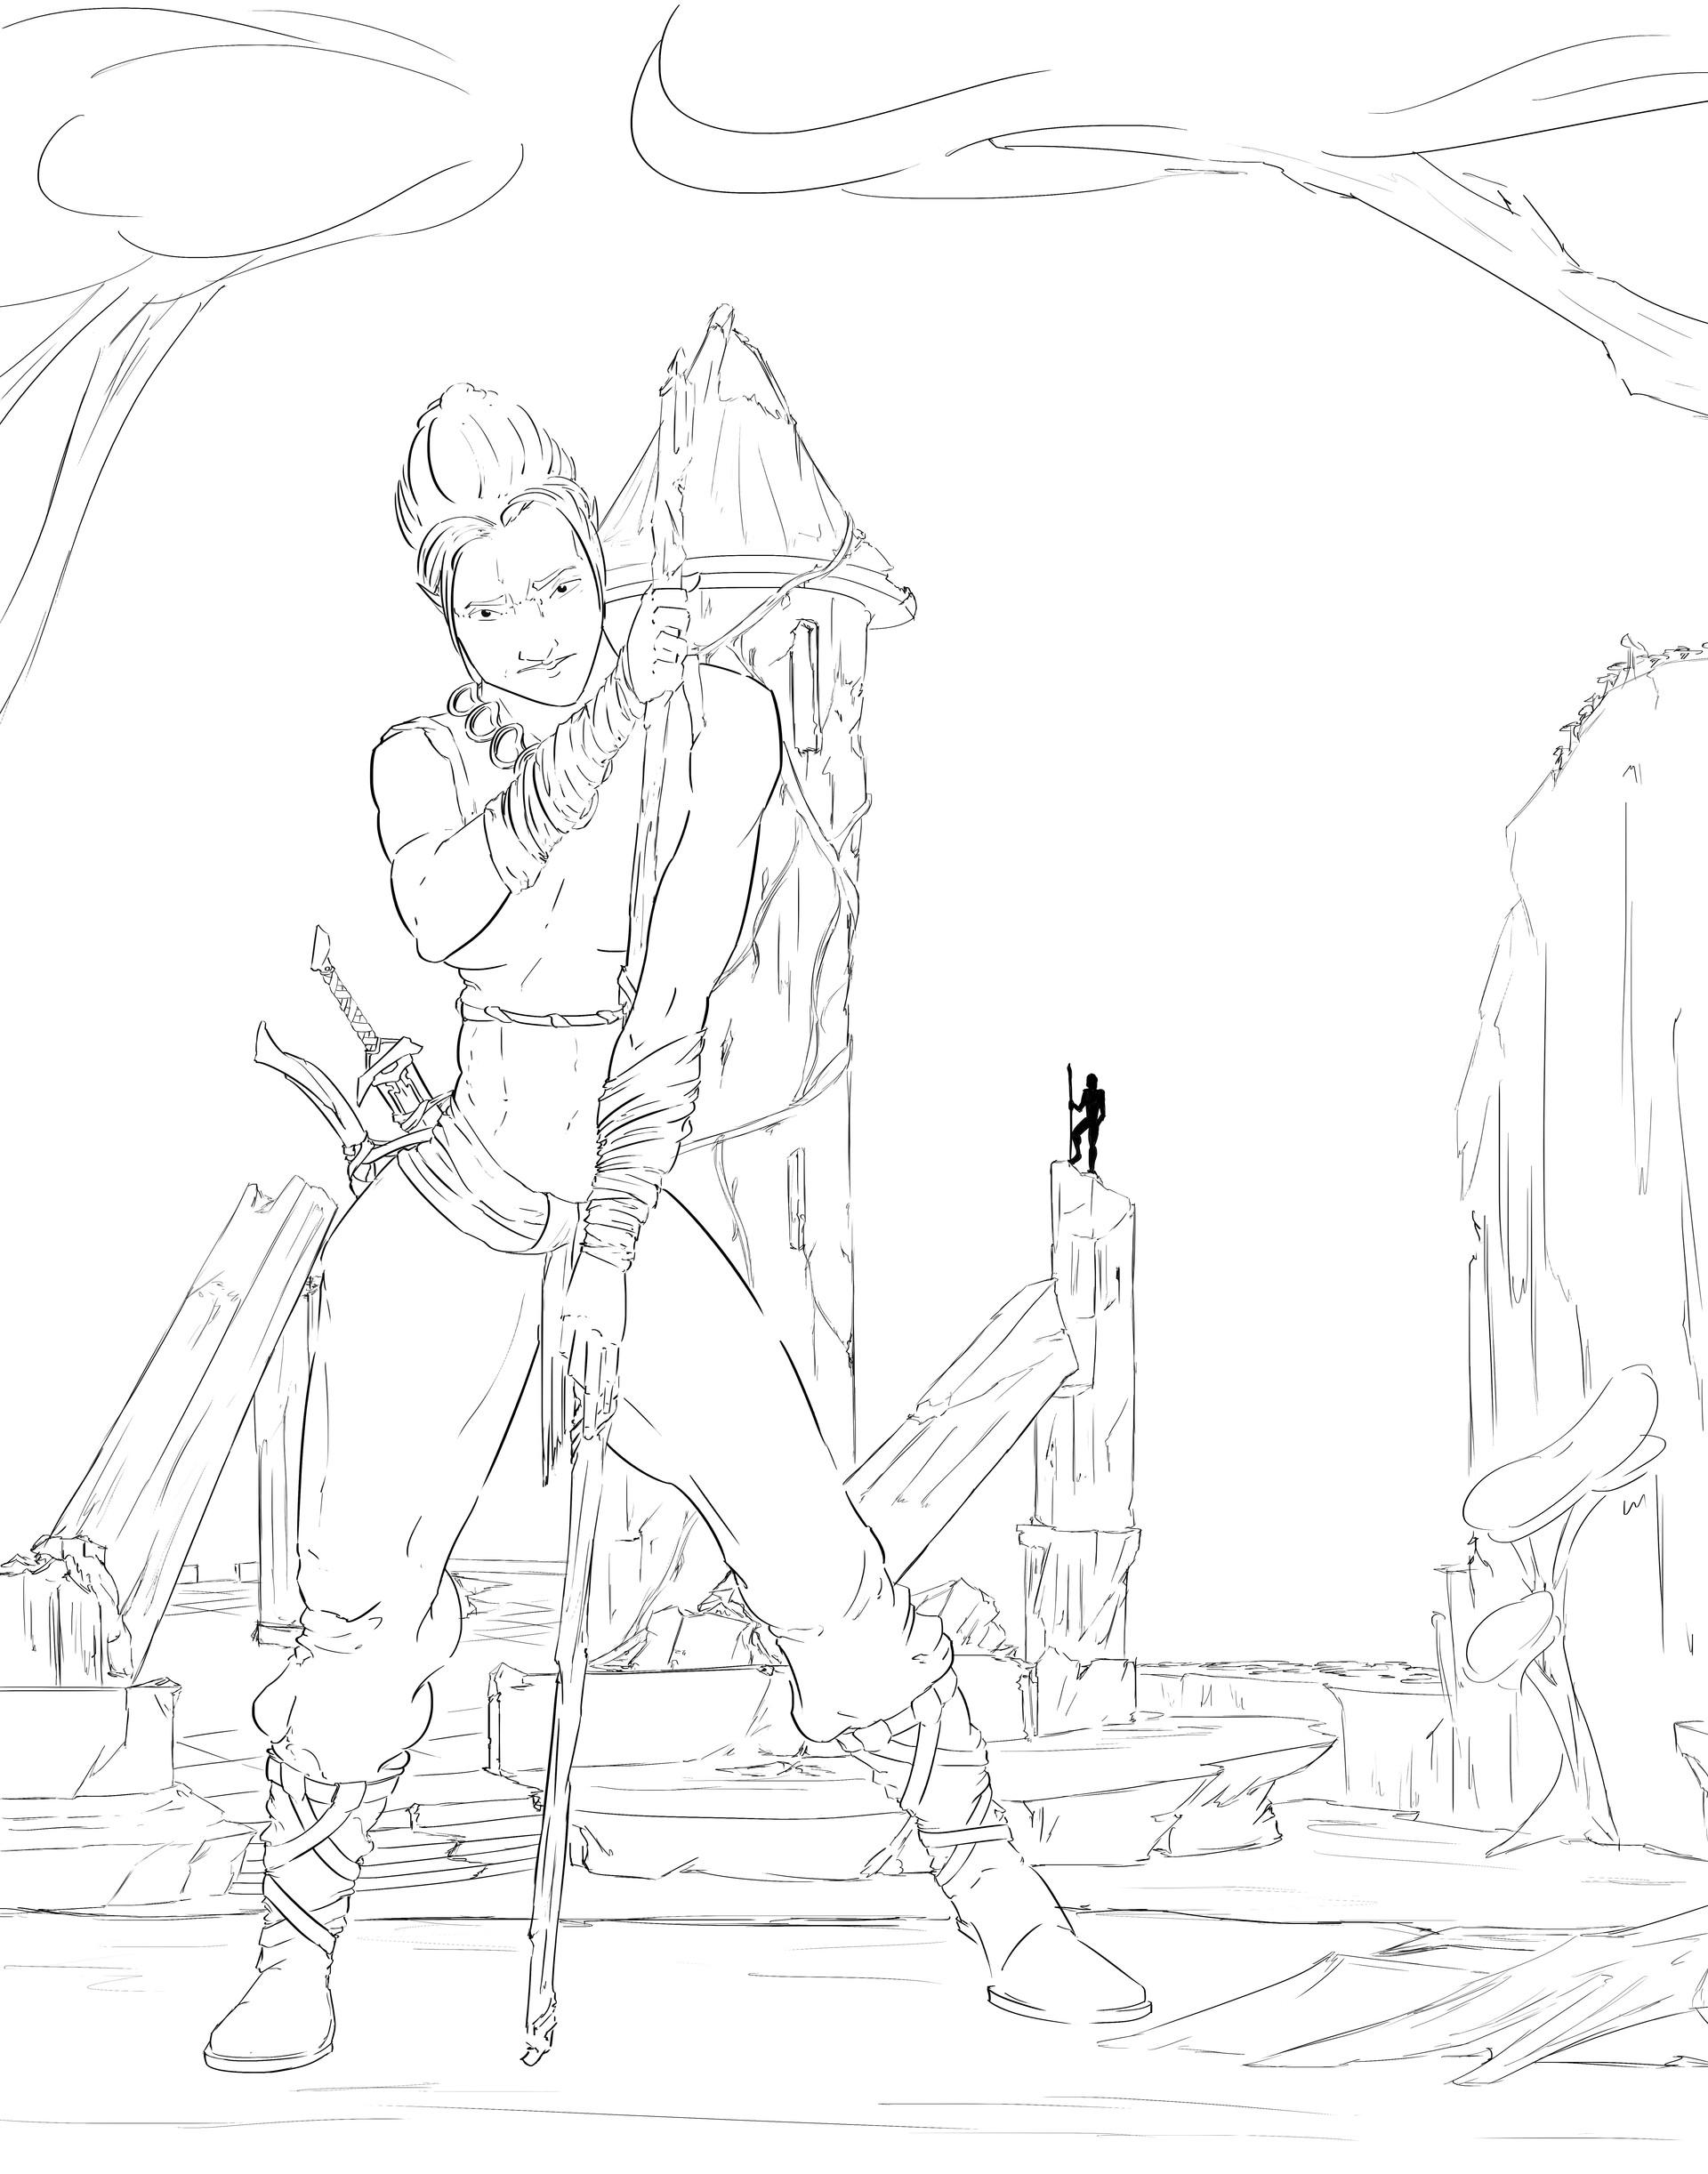 Full Line Drawing